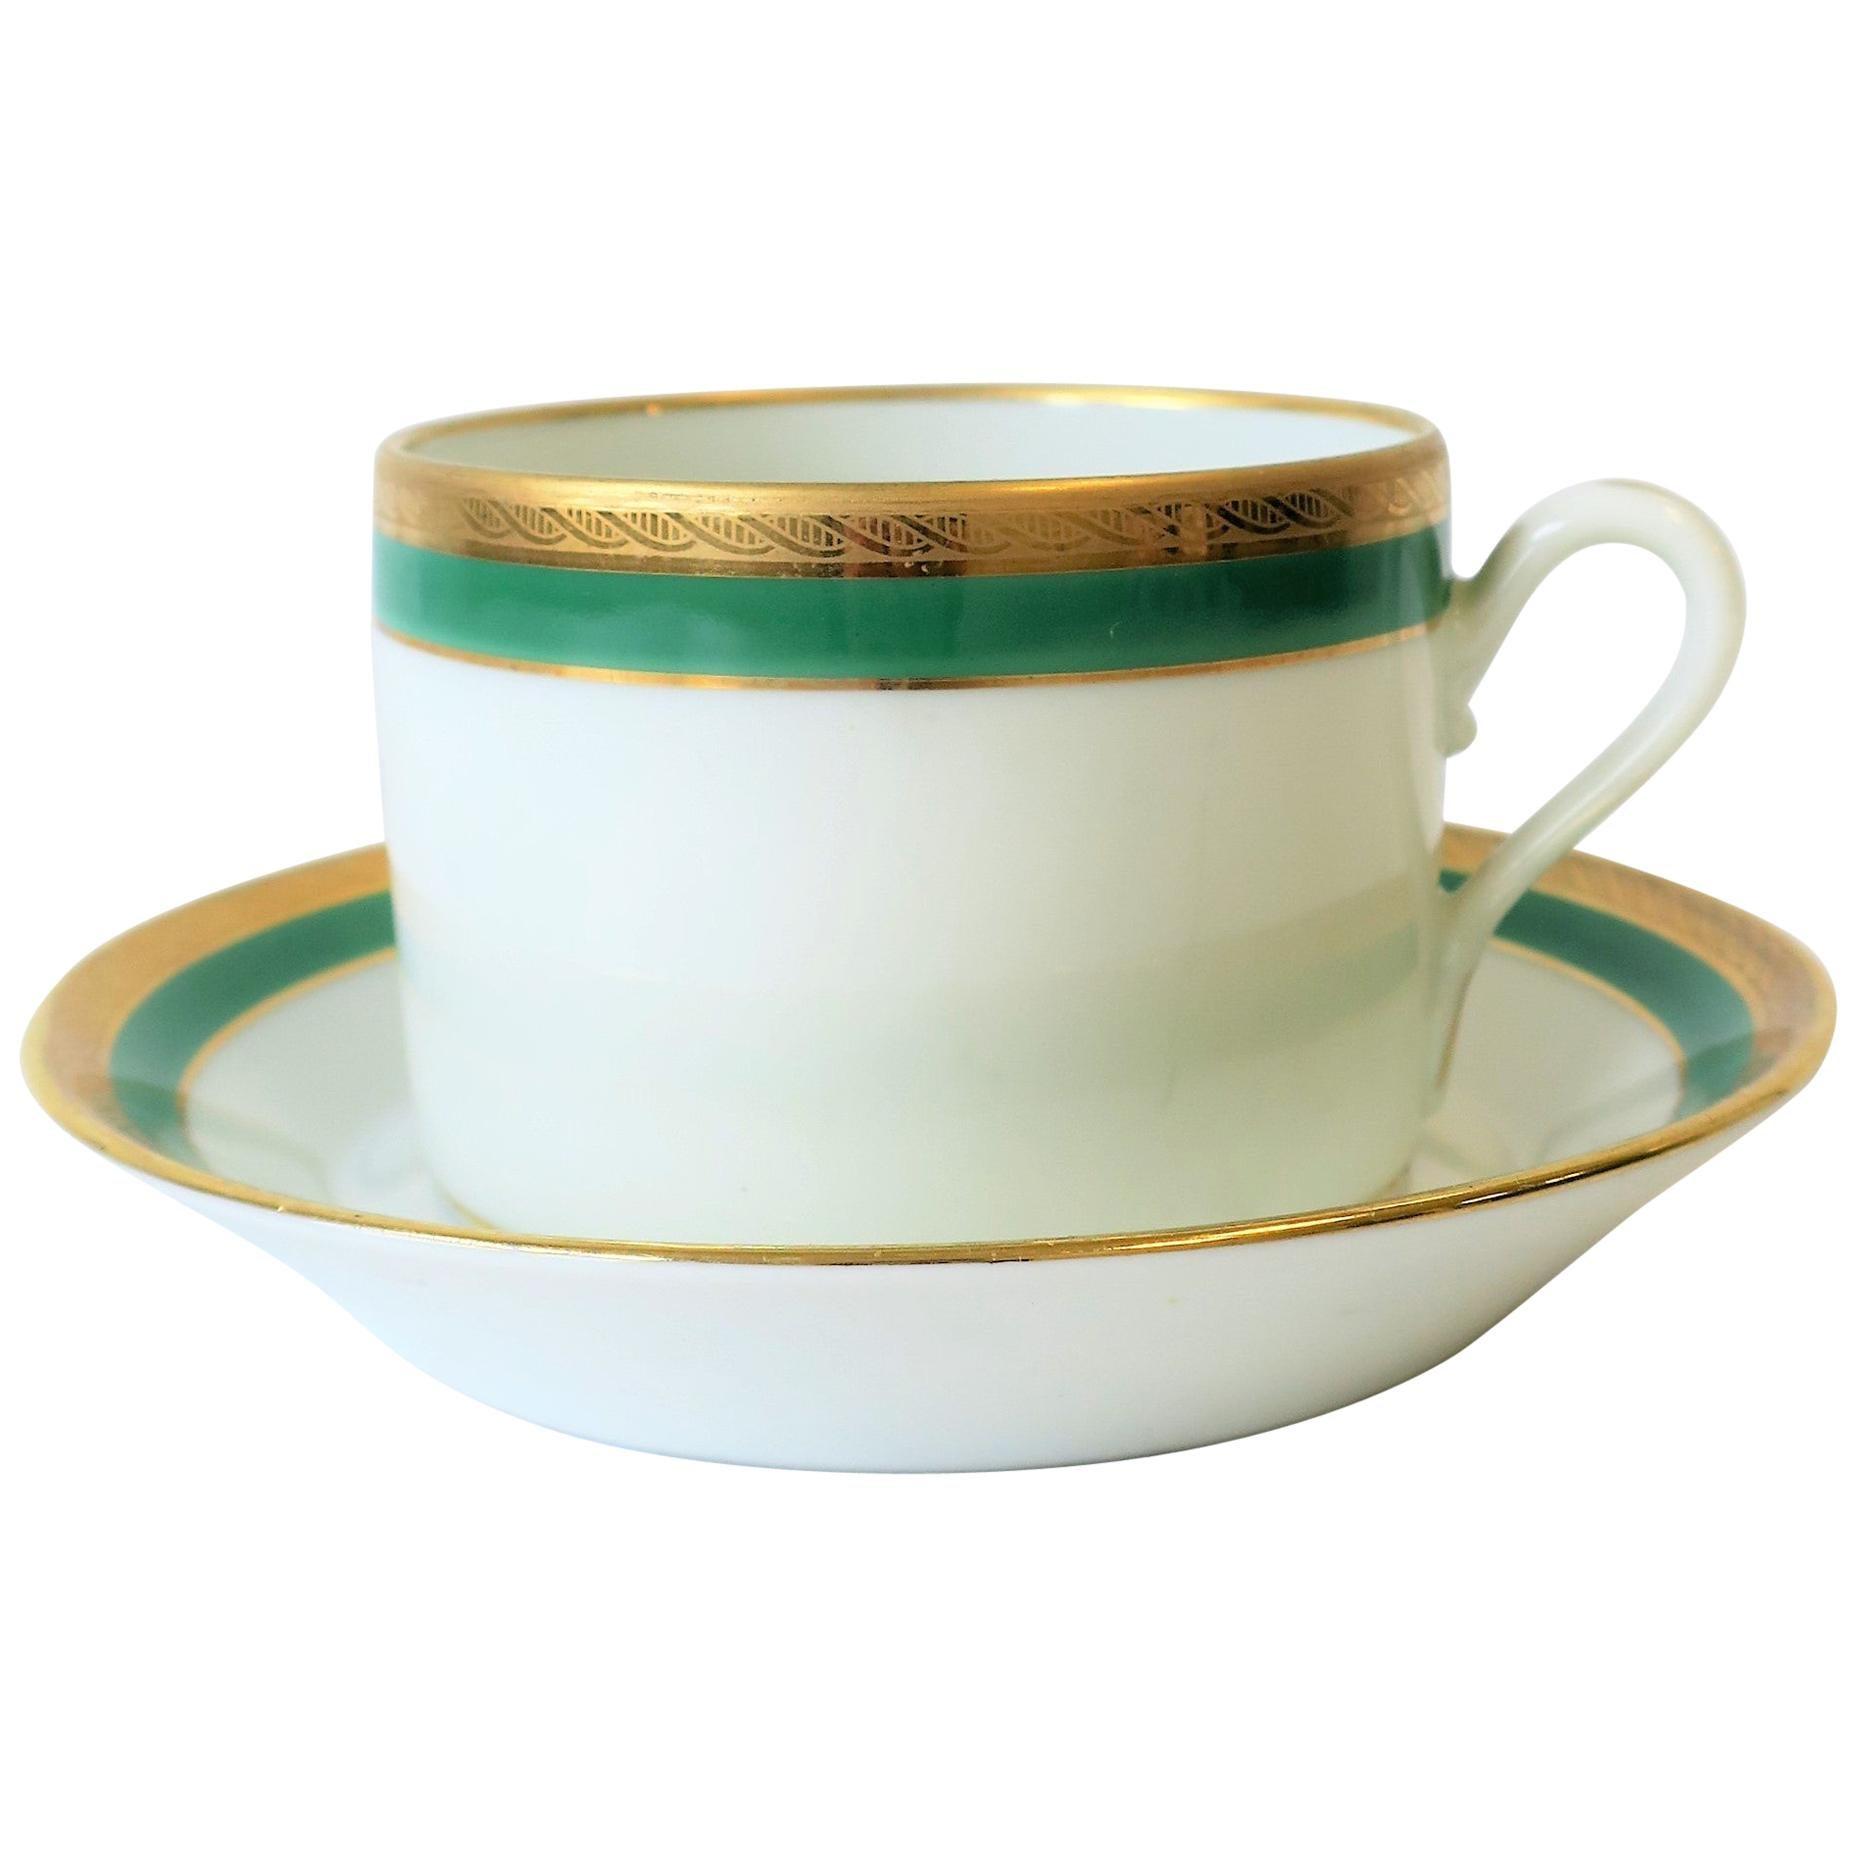 Richard Ginori Designer Italian Coffee or Tea Cup and Saucer in Green and Gold